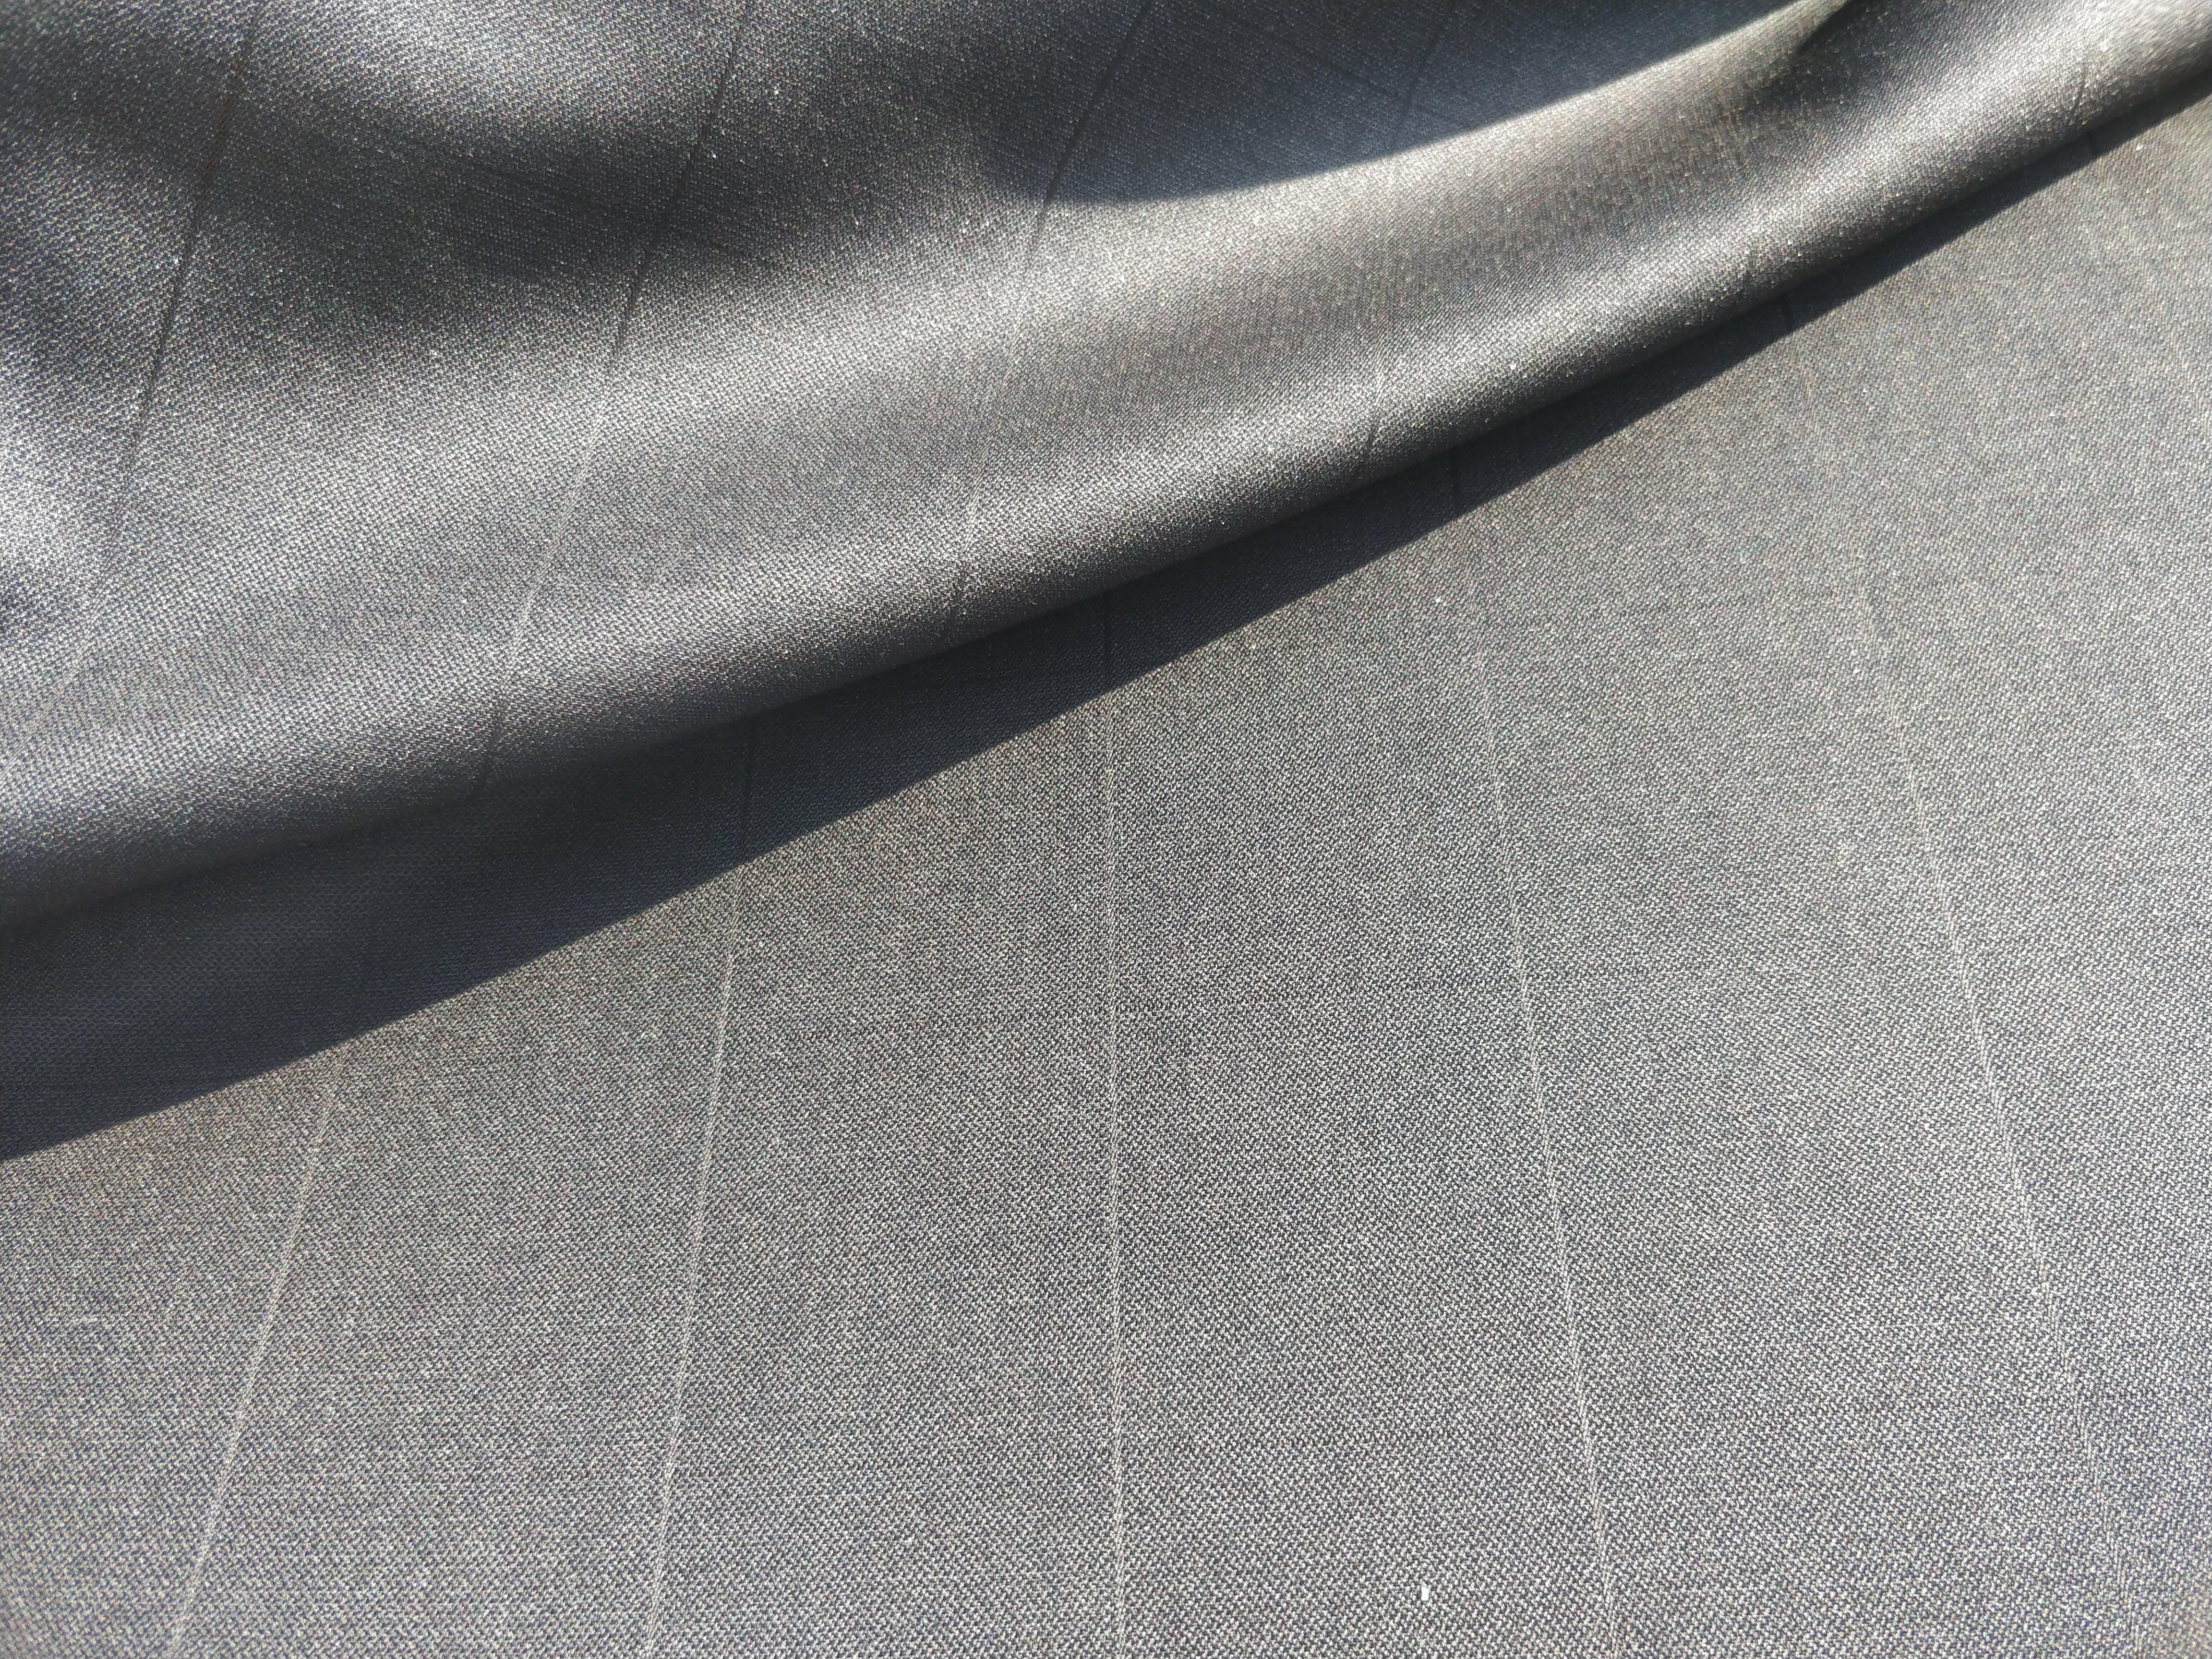 Fekete szolid kockás 100% gyapjú